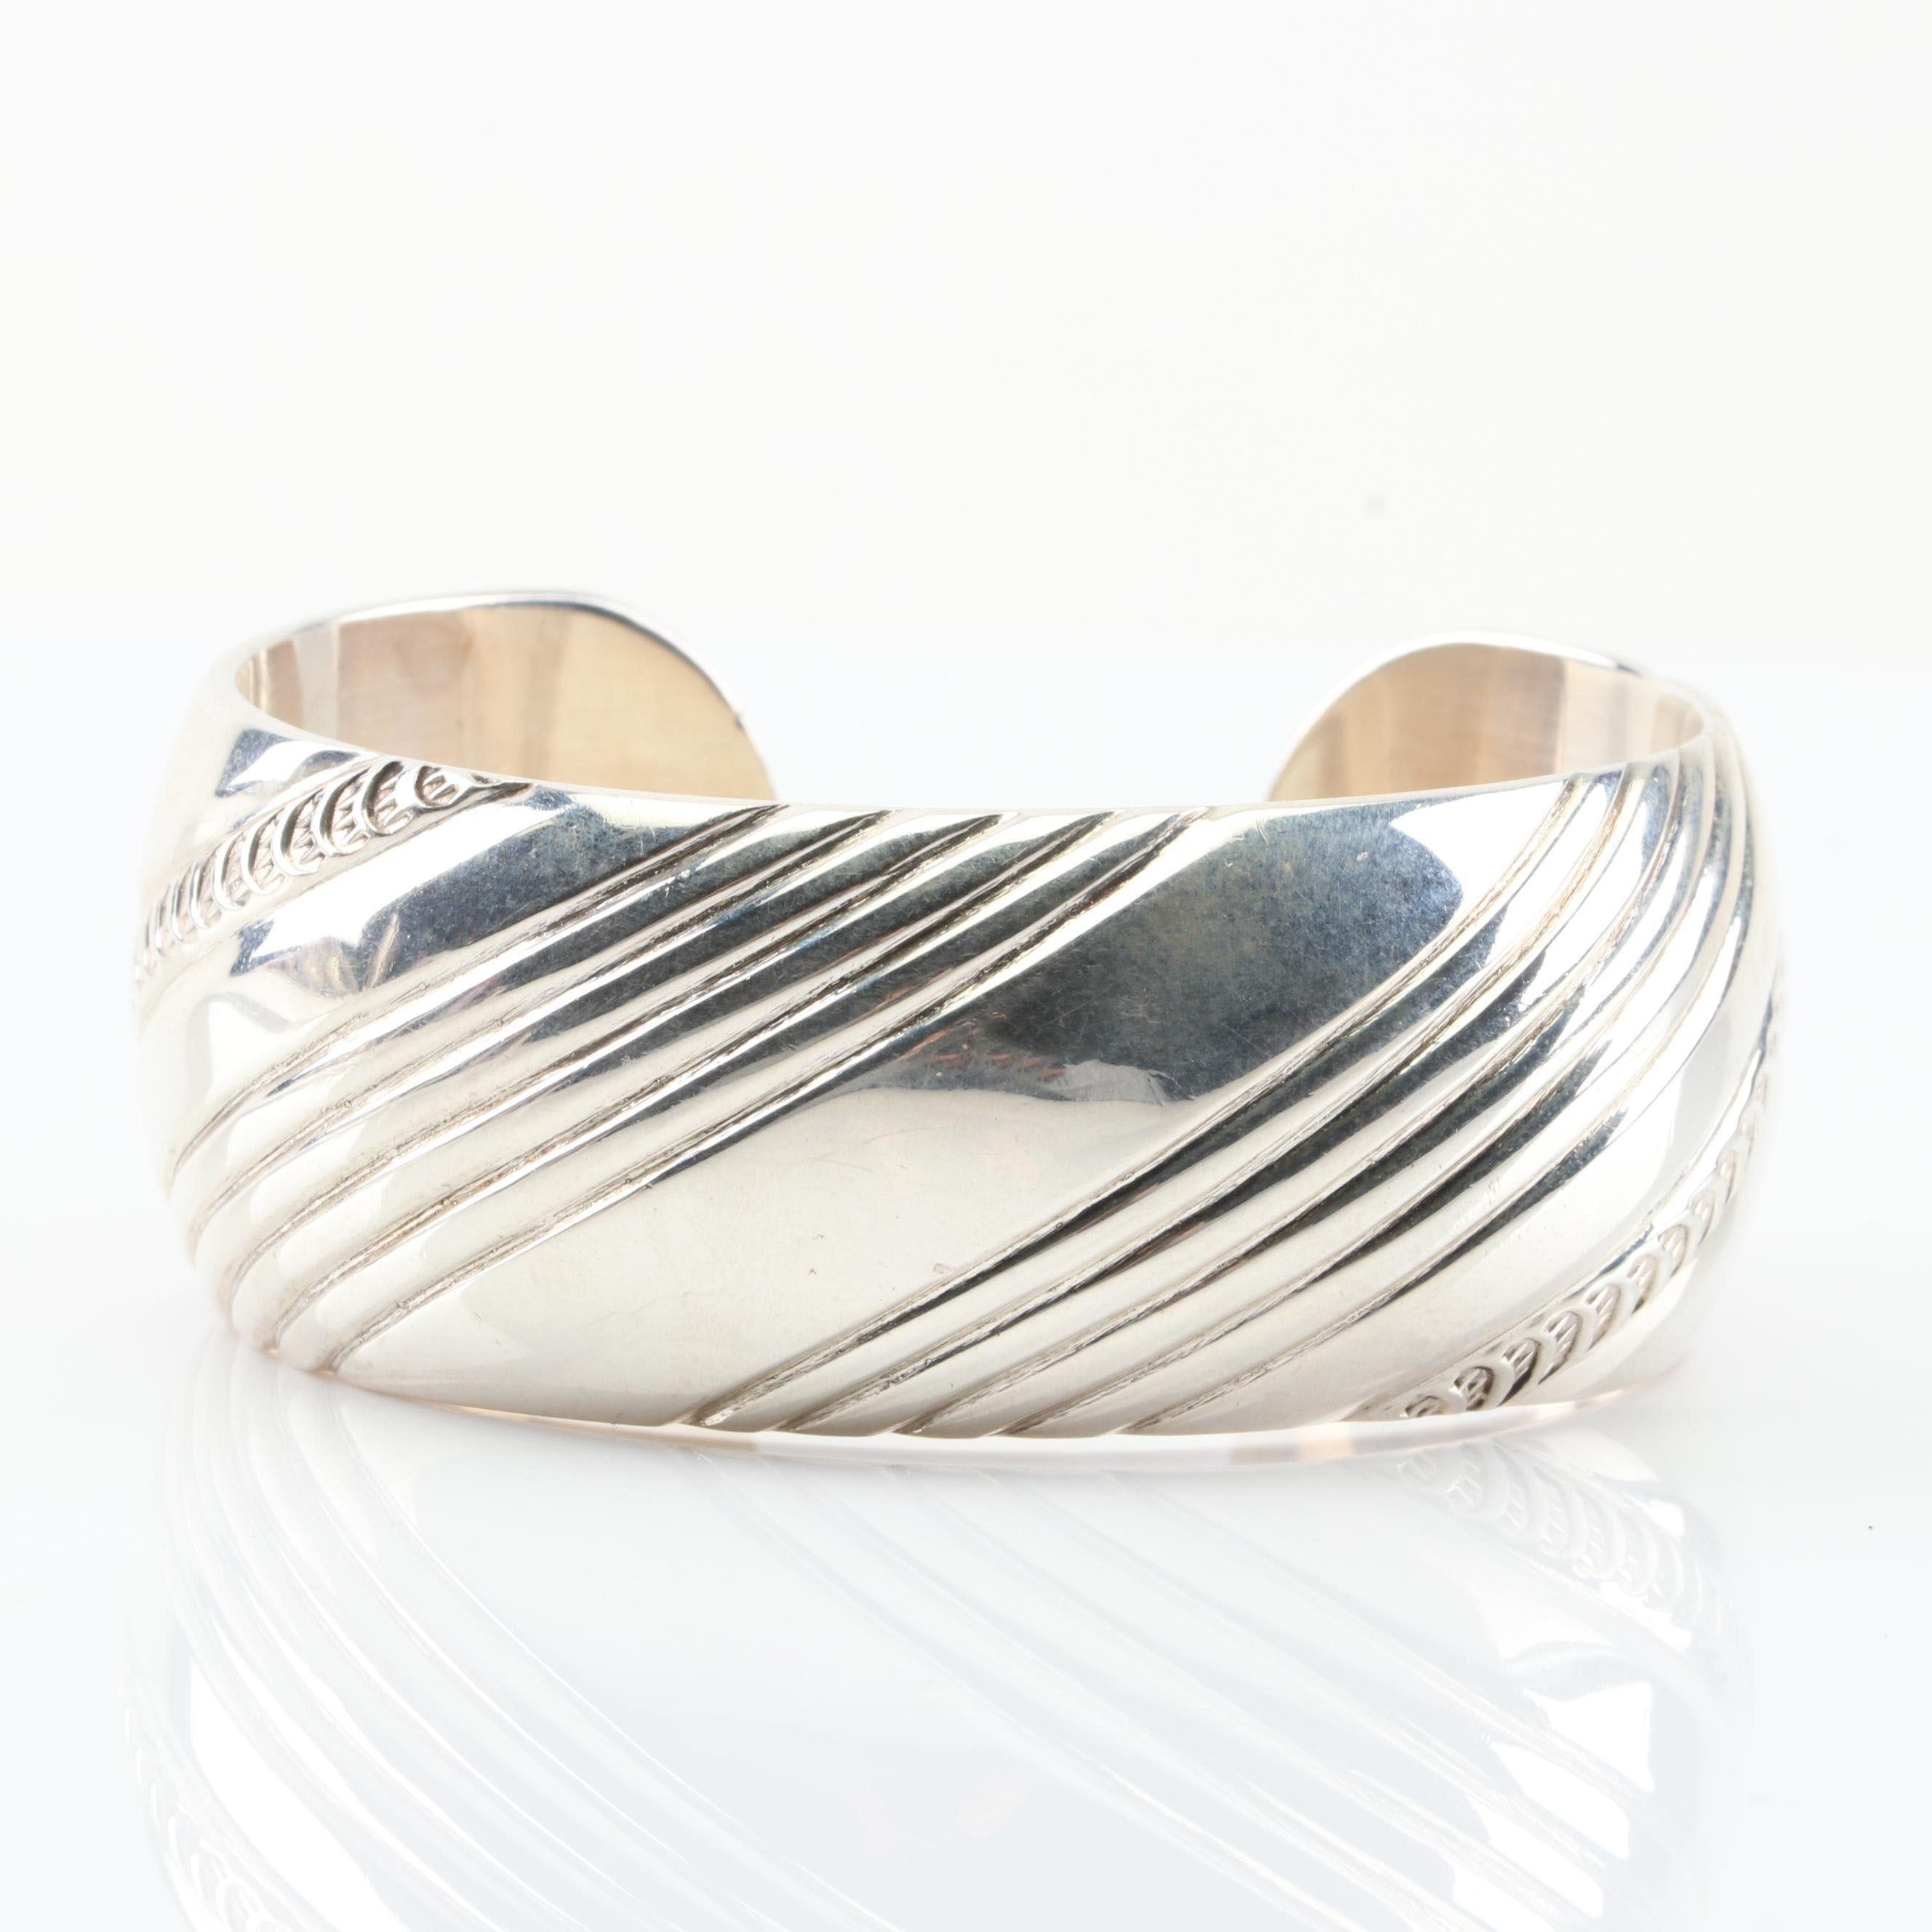 E. Bilagody Navajo Sterling Silver Cuff Bracelet